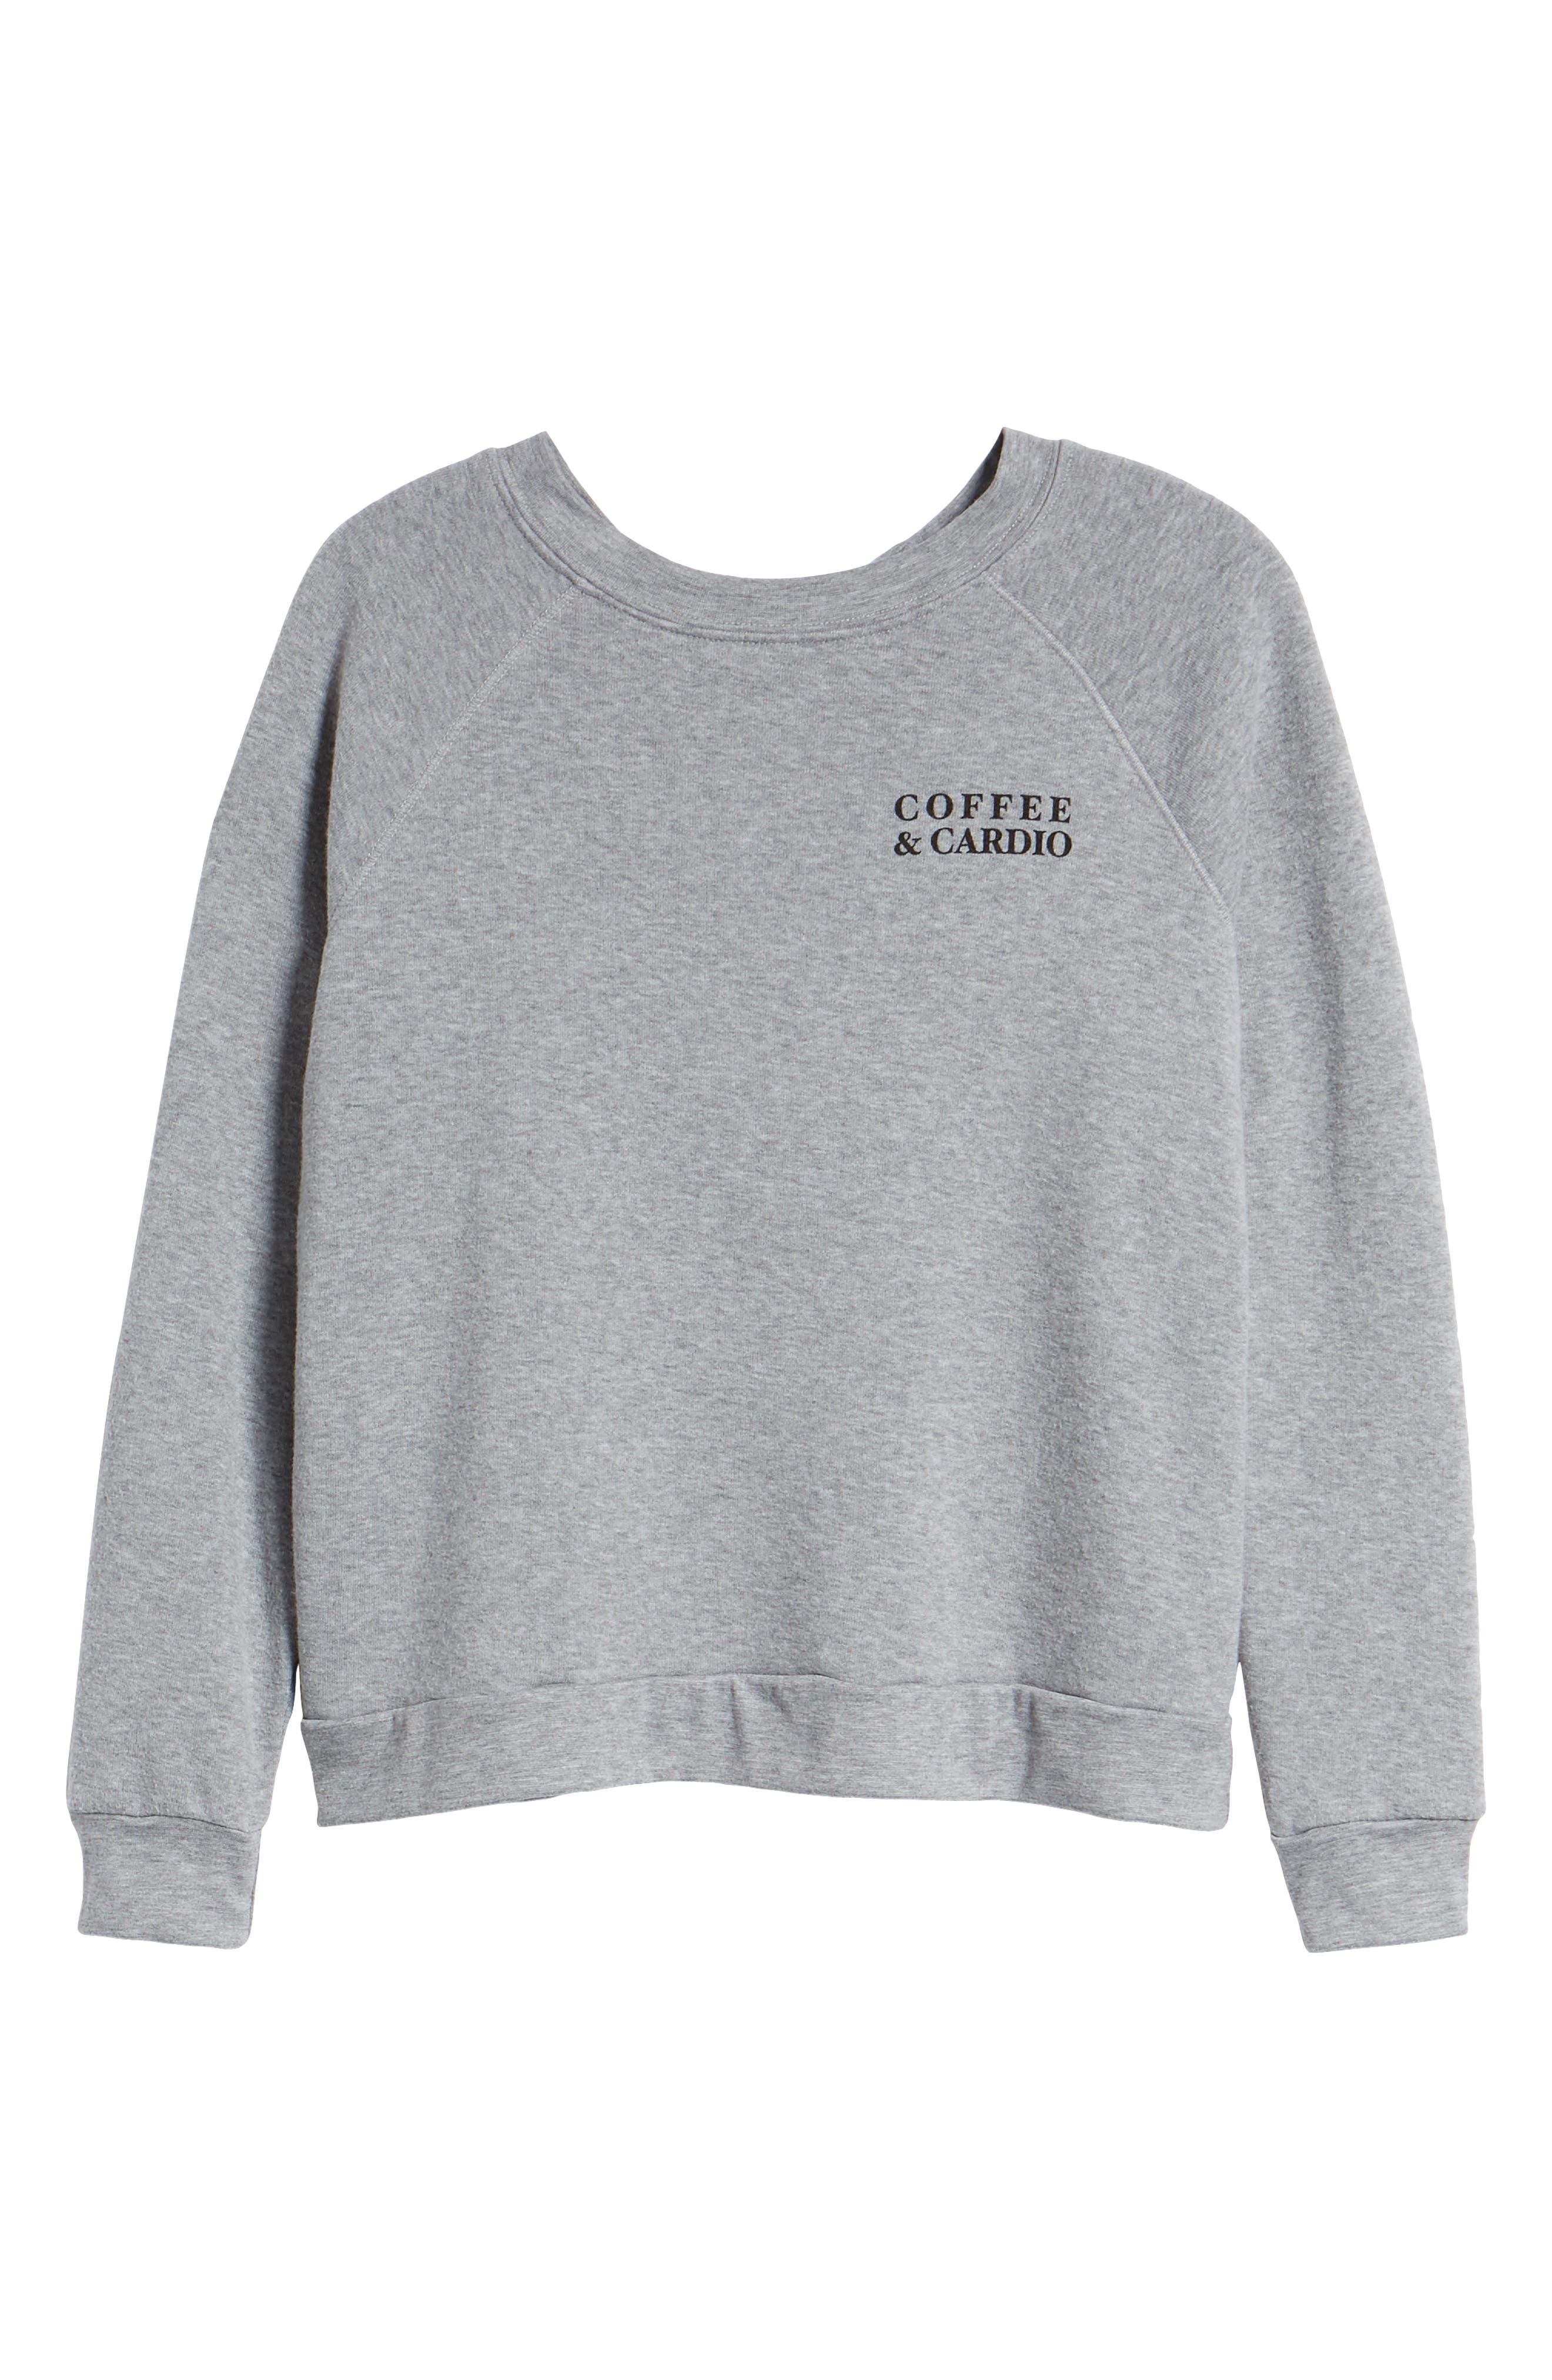 Reversible Graphic Sweatshirt,                             Alternate thumbnail 7, color,                             HEATHER GREY